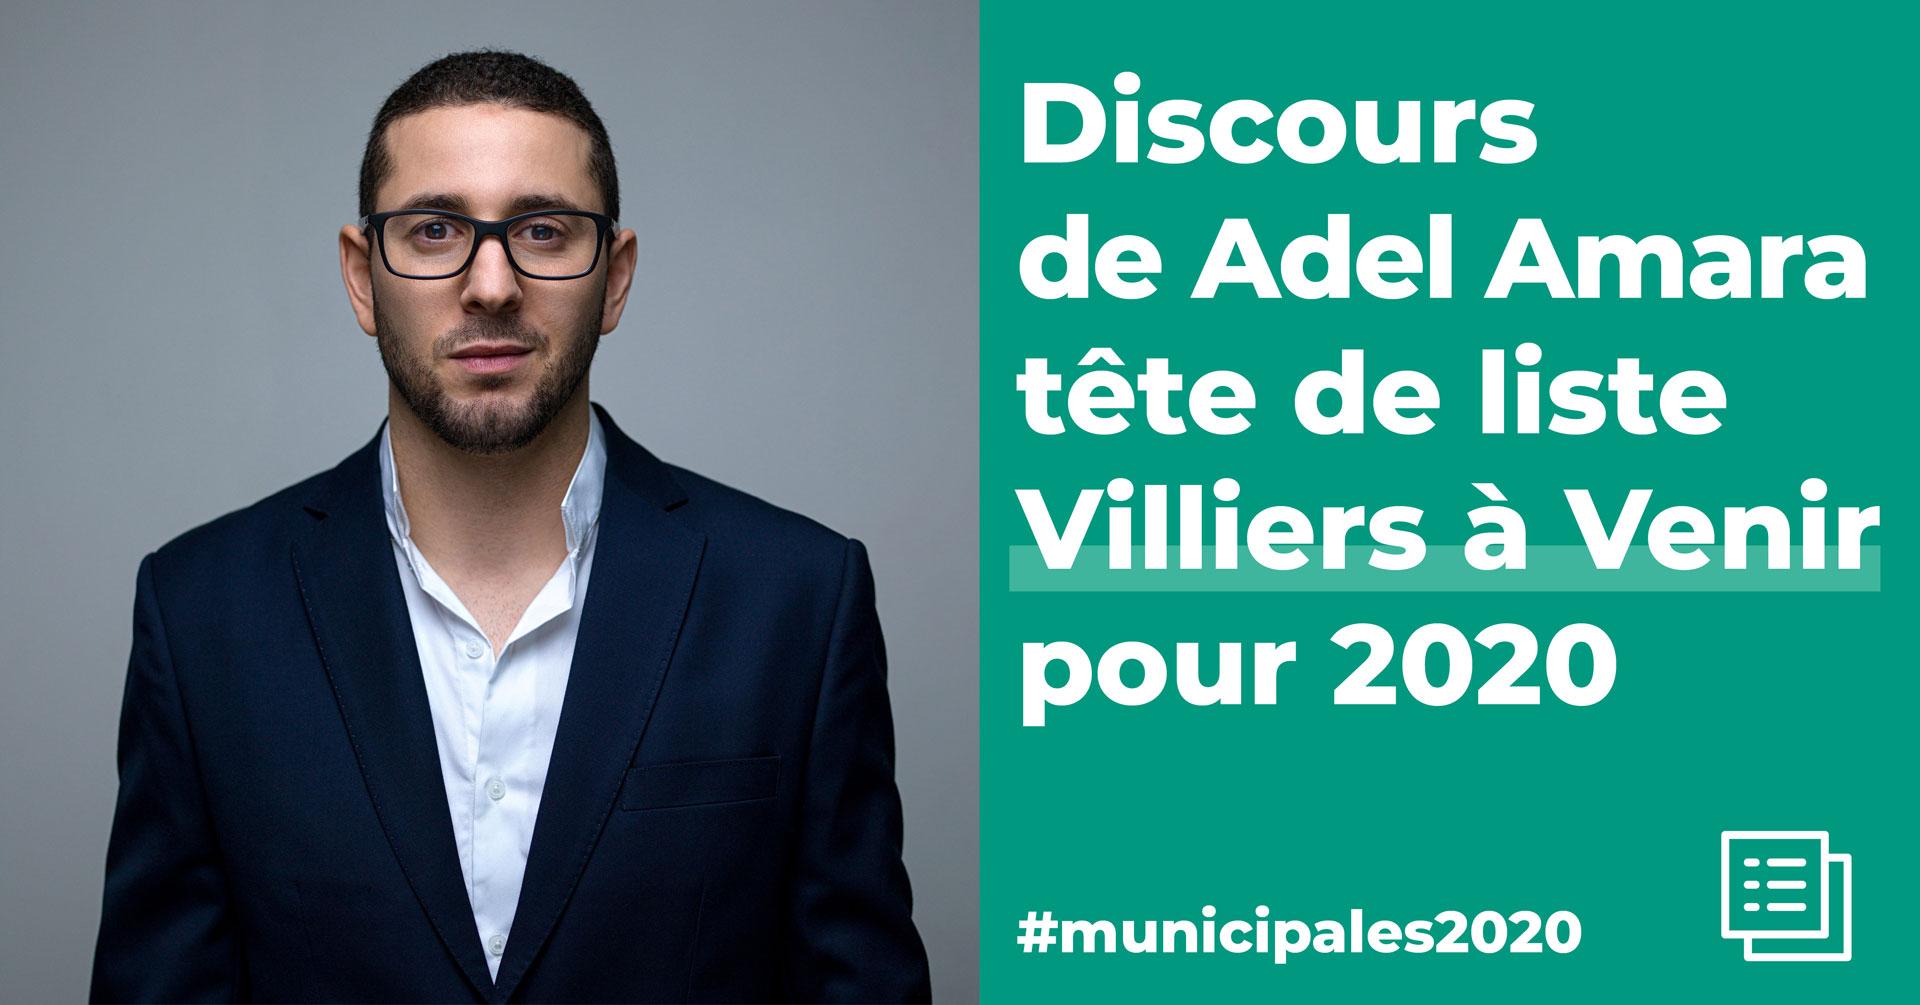 http://vav94.fr/wp-content/uploads/2020/01/DISCOURS-ADEL-AMARA-TETE-DE-LISTES-VAV-94-VILLIERS-AVENIR-VILLIERS-SUR-MARNE-MUNICIPALES-2020-2.jpg